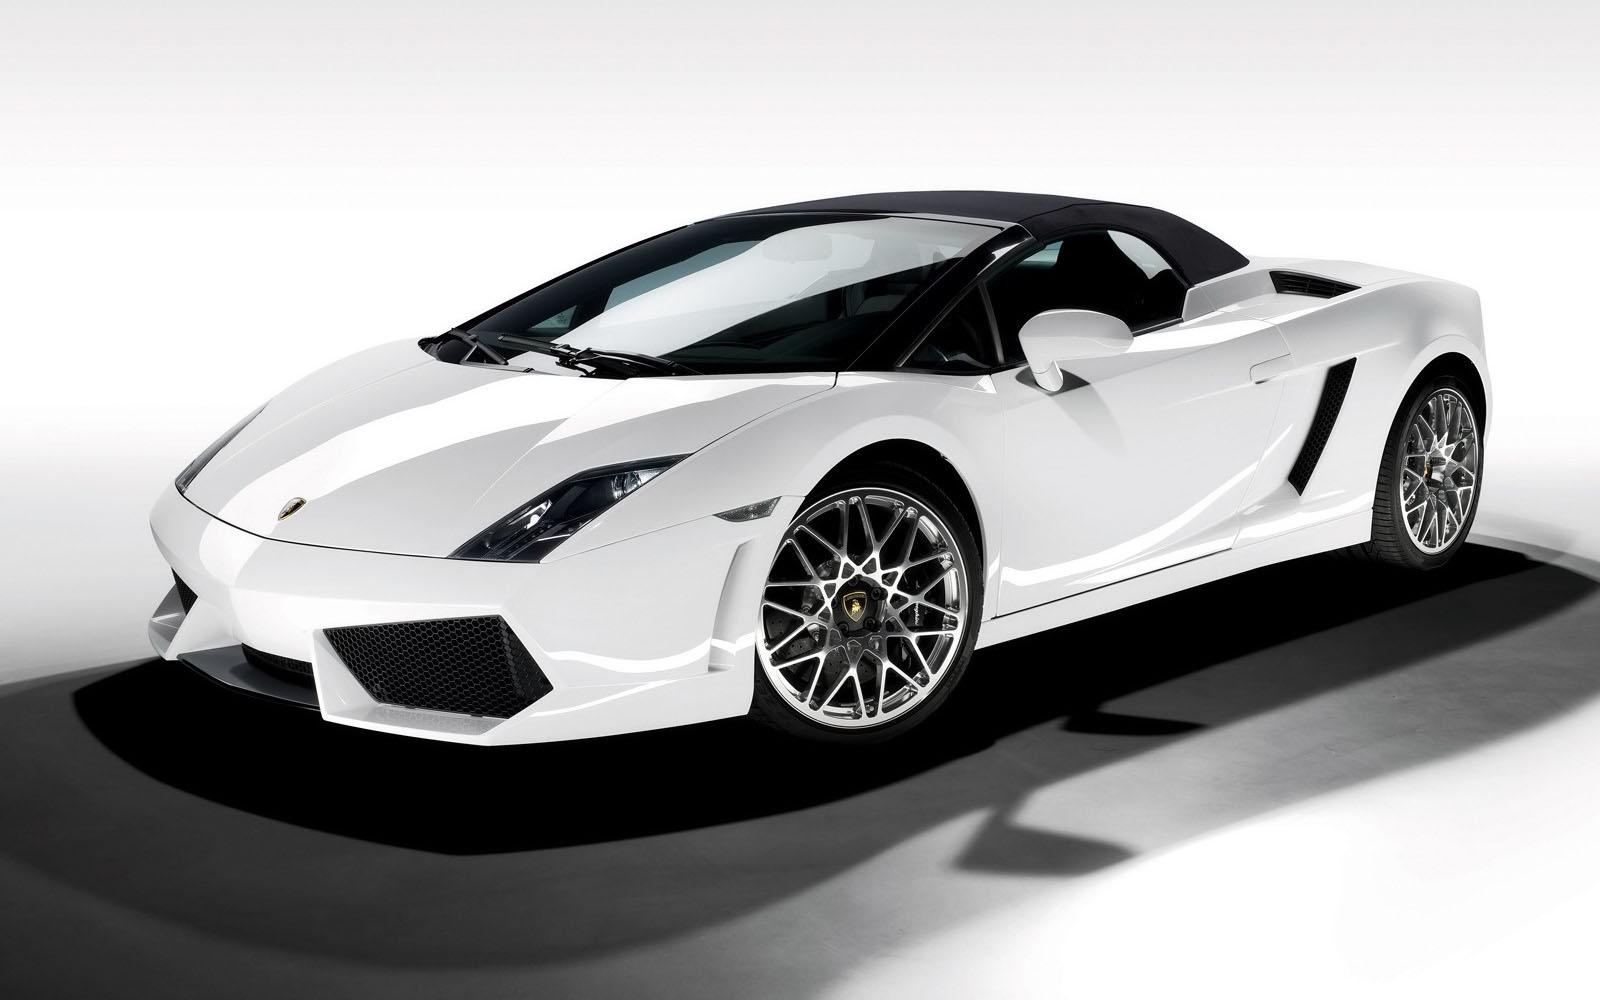 Lamborghini Gallardo Backgrounds Wallpapersafari